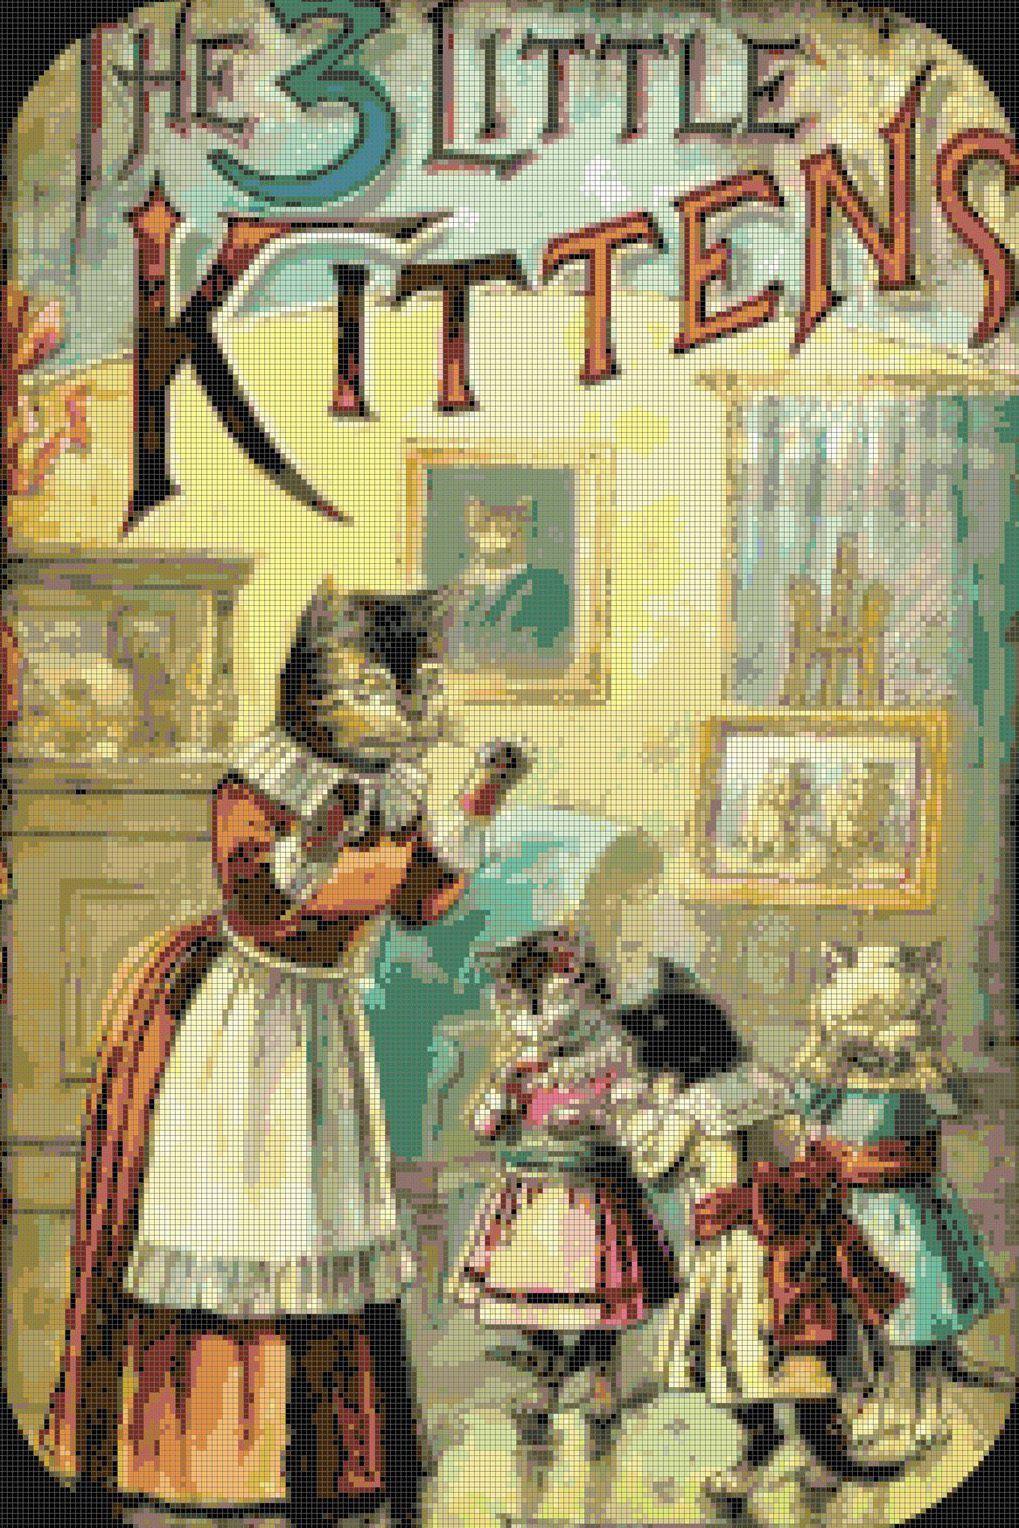 Details About Vintage Three Little Kittens Nursery Rhyme Digital Counted Cross Stitch Pattern Little Kittens Kittens Cat Art